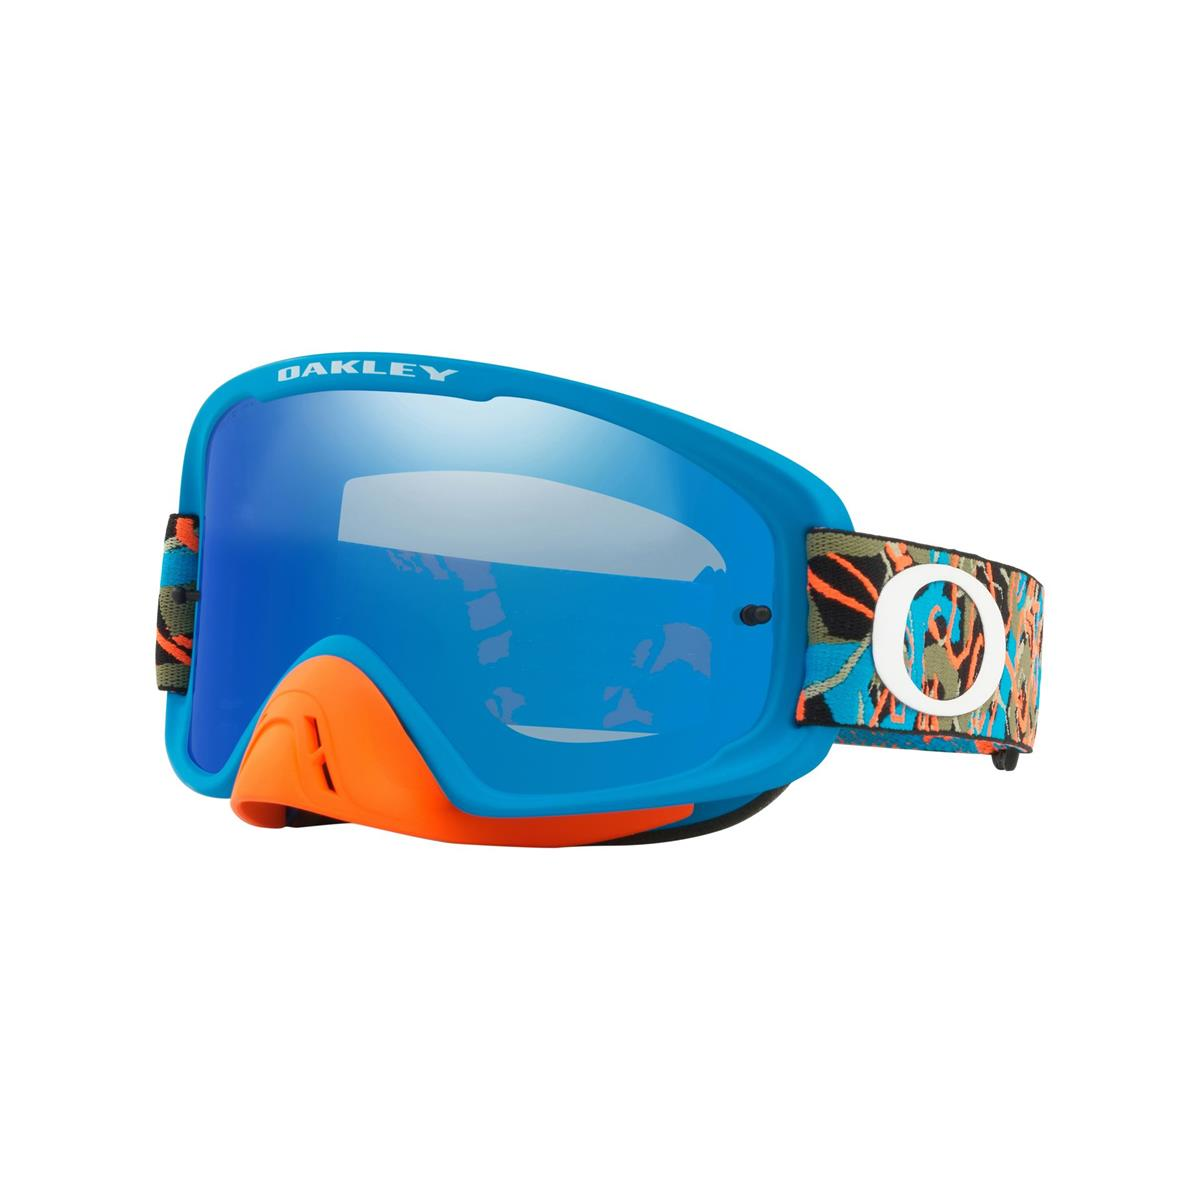 7125a529ea Oakley MX Goggle O Frame 2.0 MX Camo Vine Jungle Blue Orange - Black ...